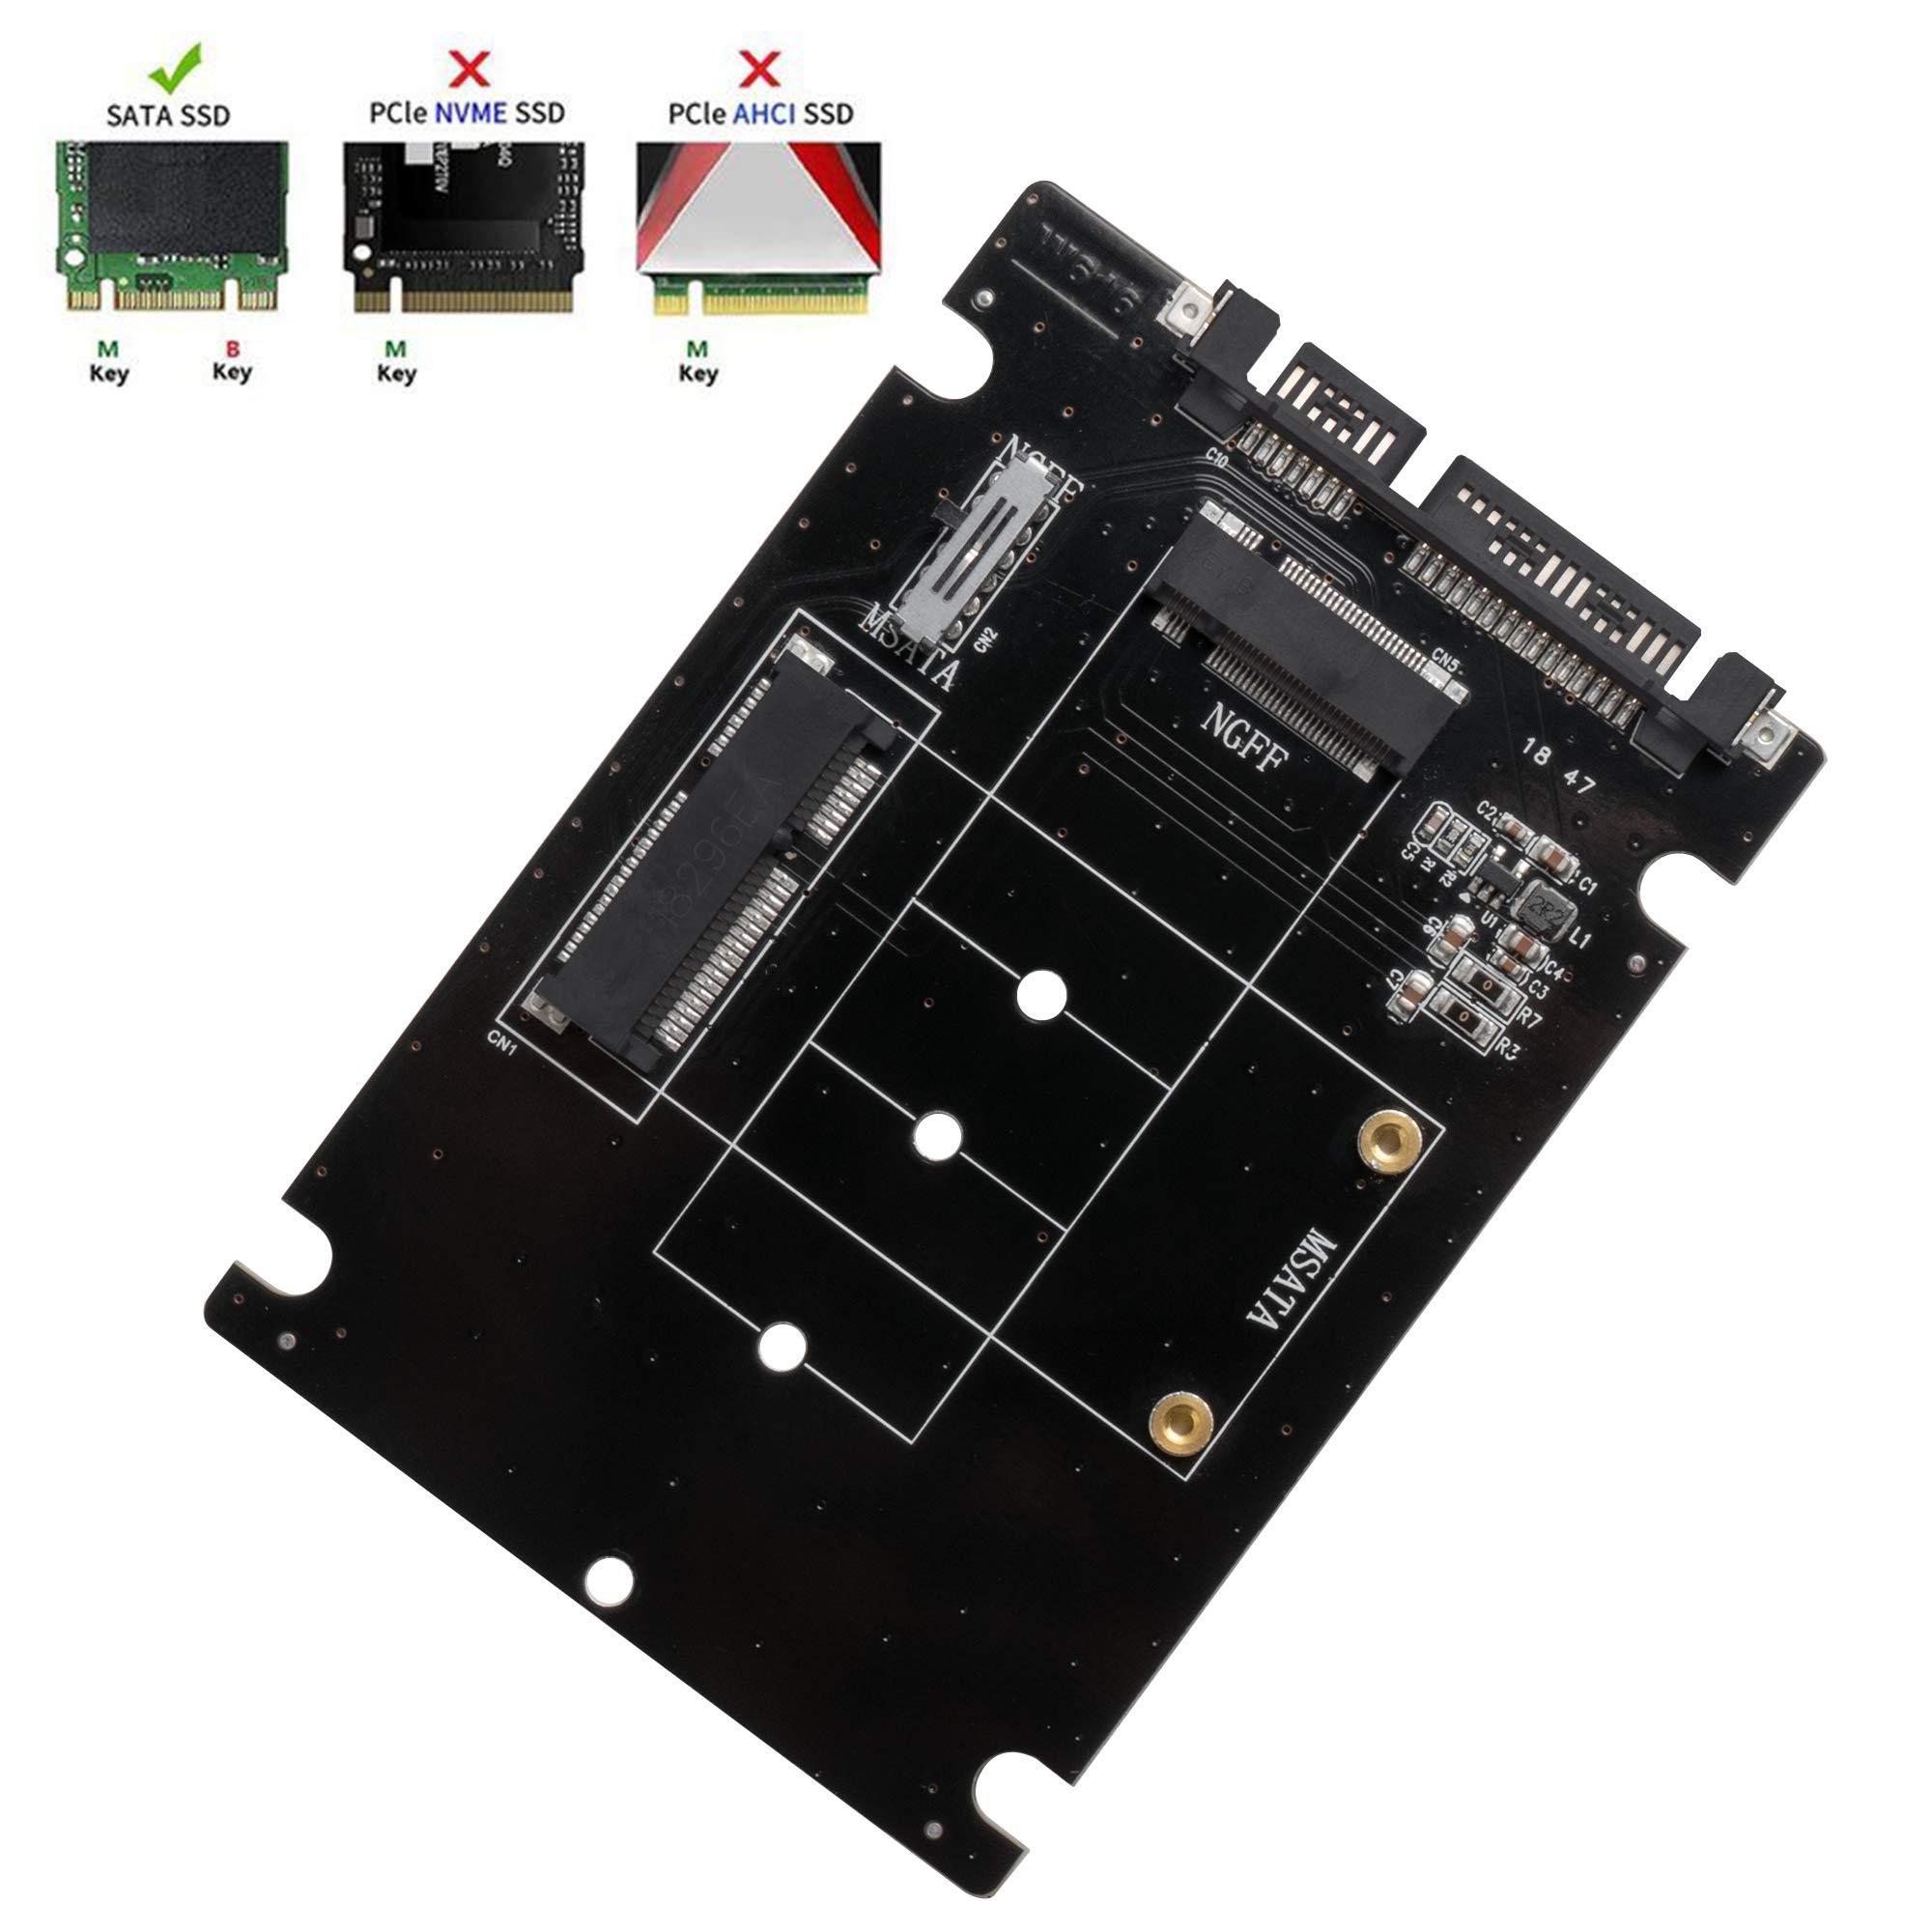 Adaptador QNINE M.2 o MSATA a SATA 3.0, tarjeta 2 en 1 compatible con Mini SATA o Ngff B Key SSD Converter a disco duro